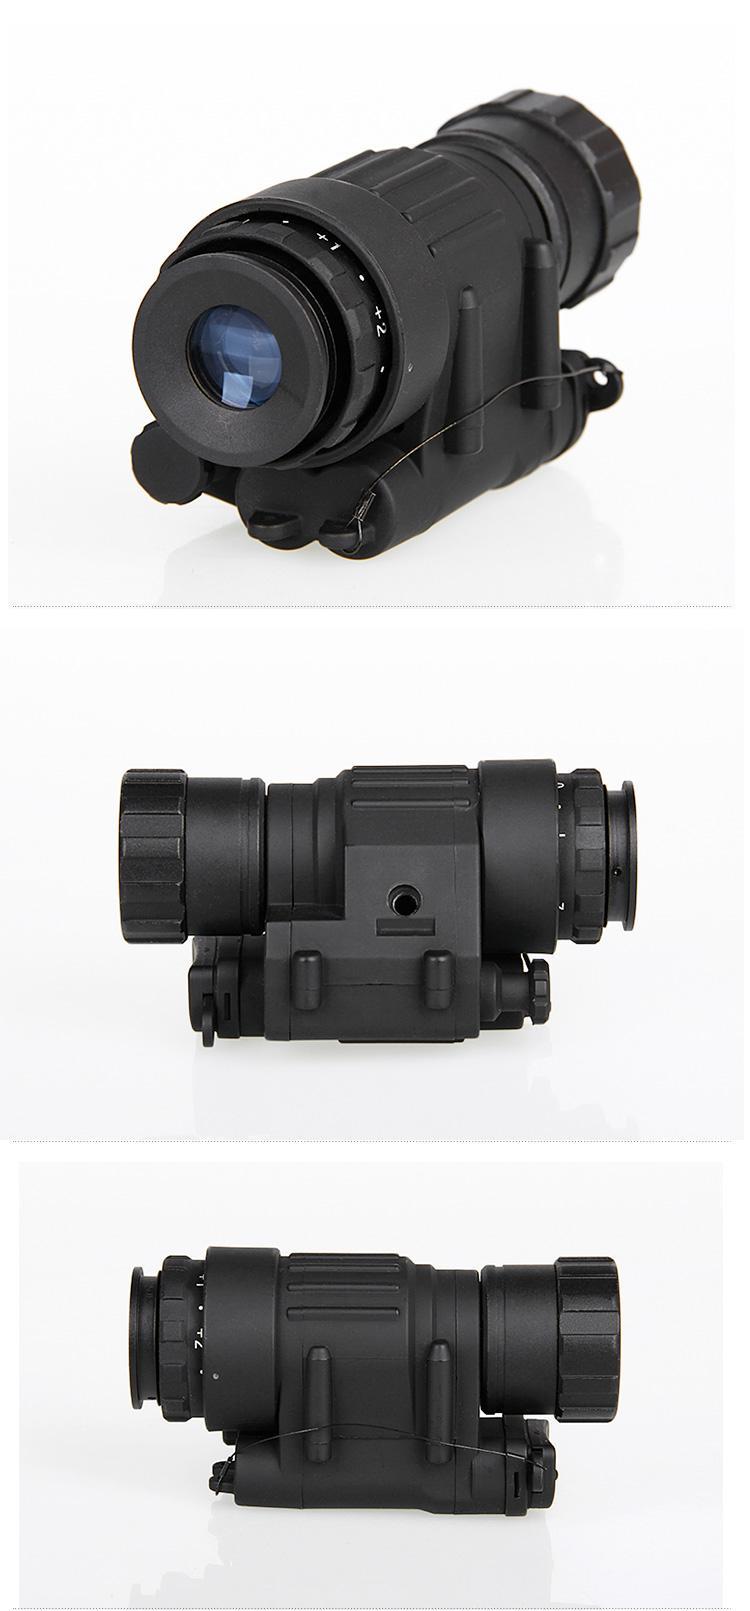 Eagleeye Good Design Ottica Digital Tactical Night Vision Scope Hunting Sight Wargame CL27-0008